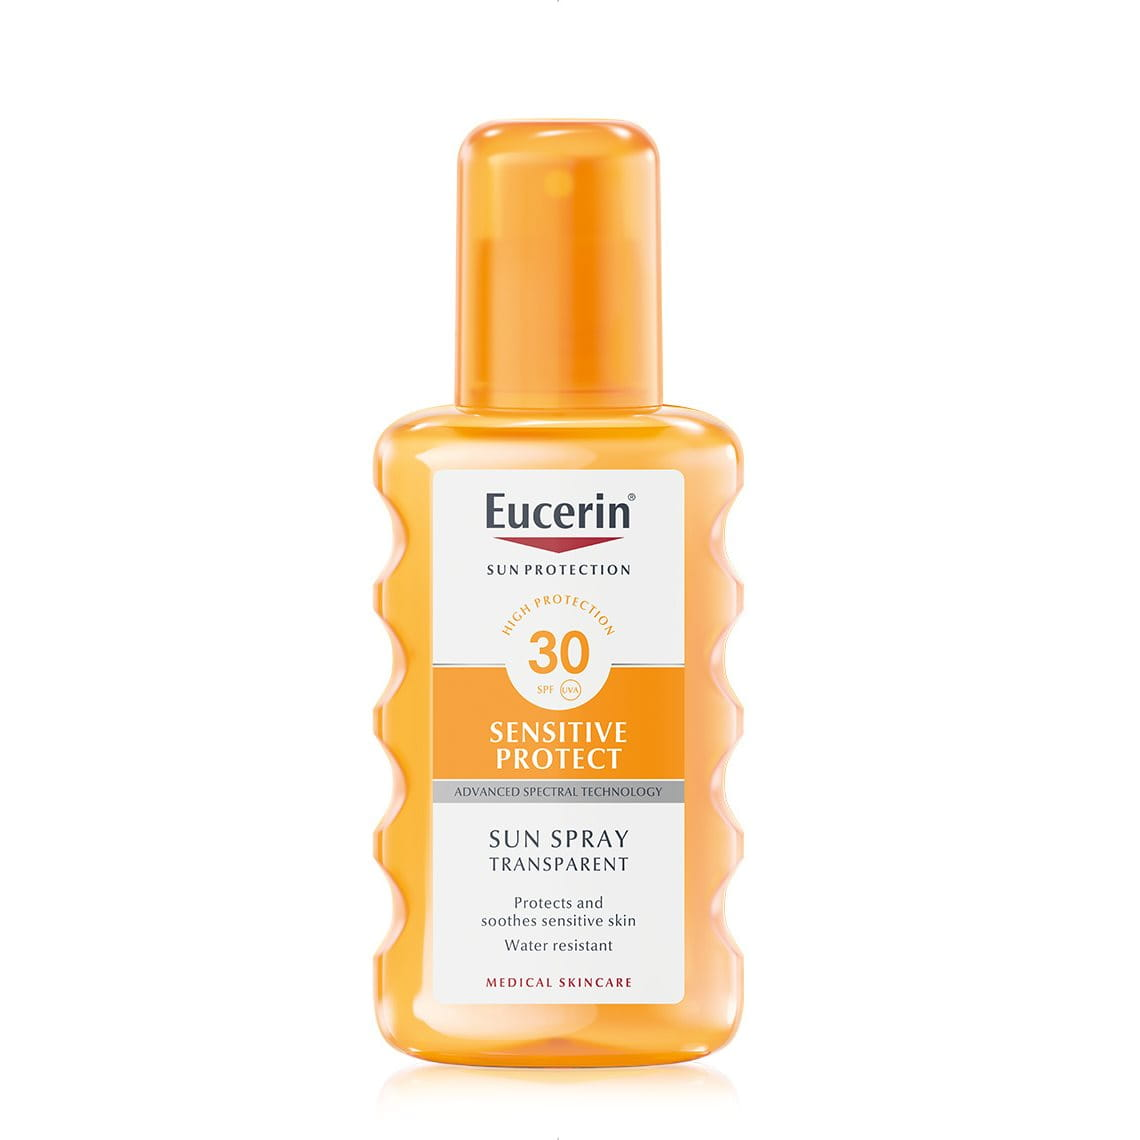 Sun Spray Transparant SPF 30 - zonnebrand - Eucerin